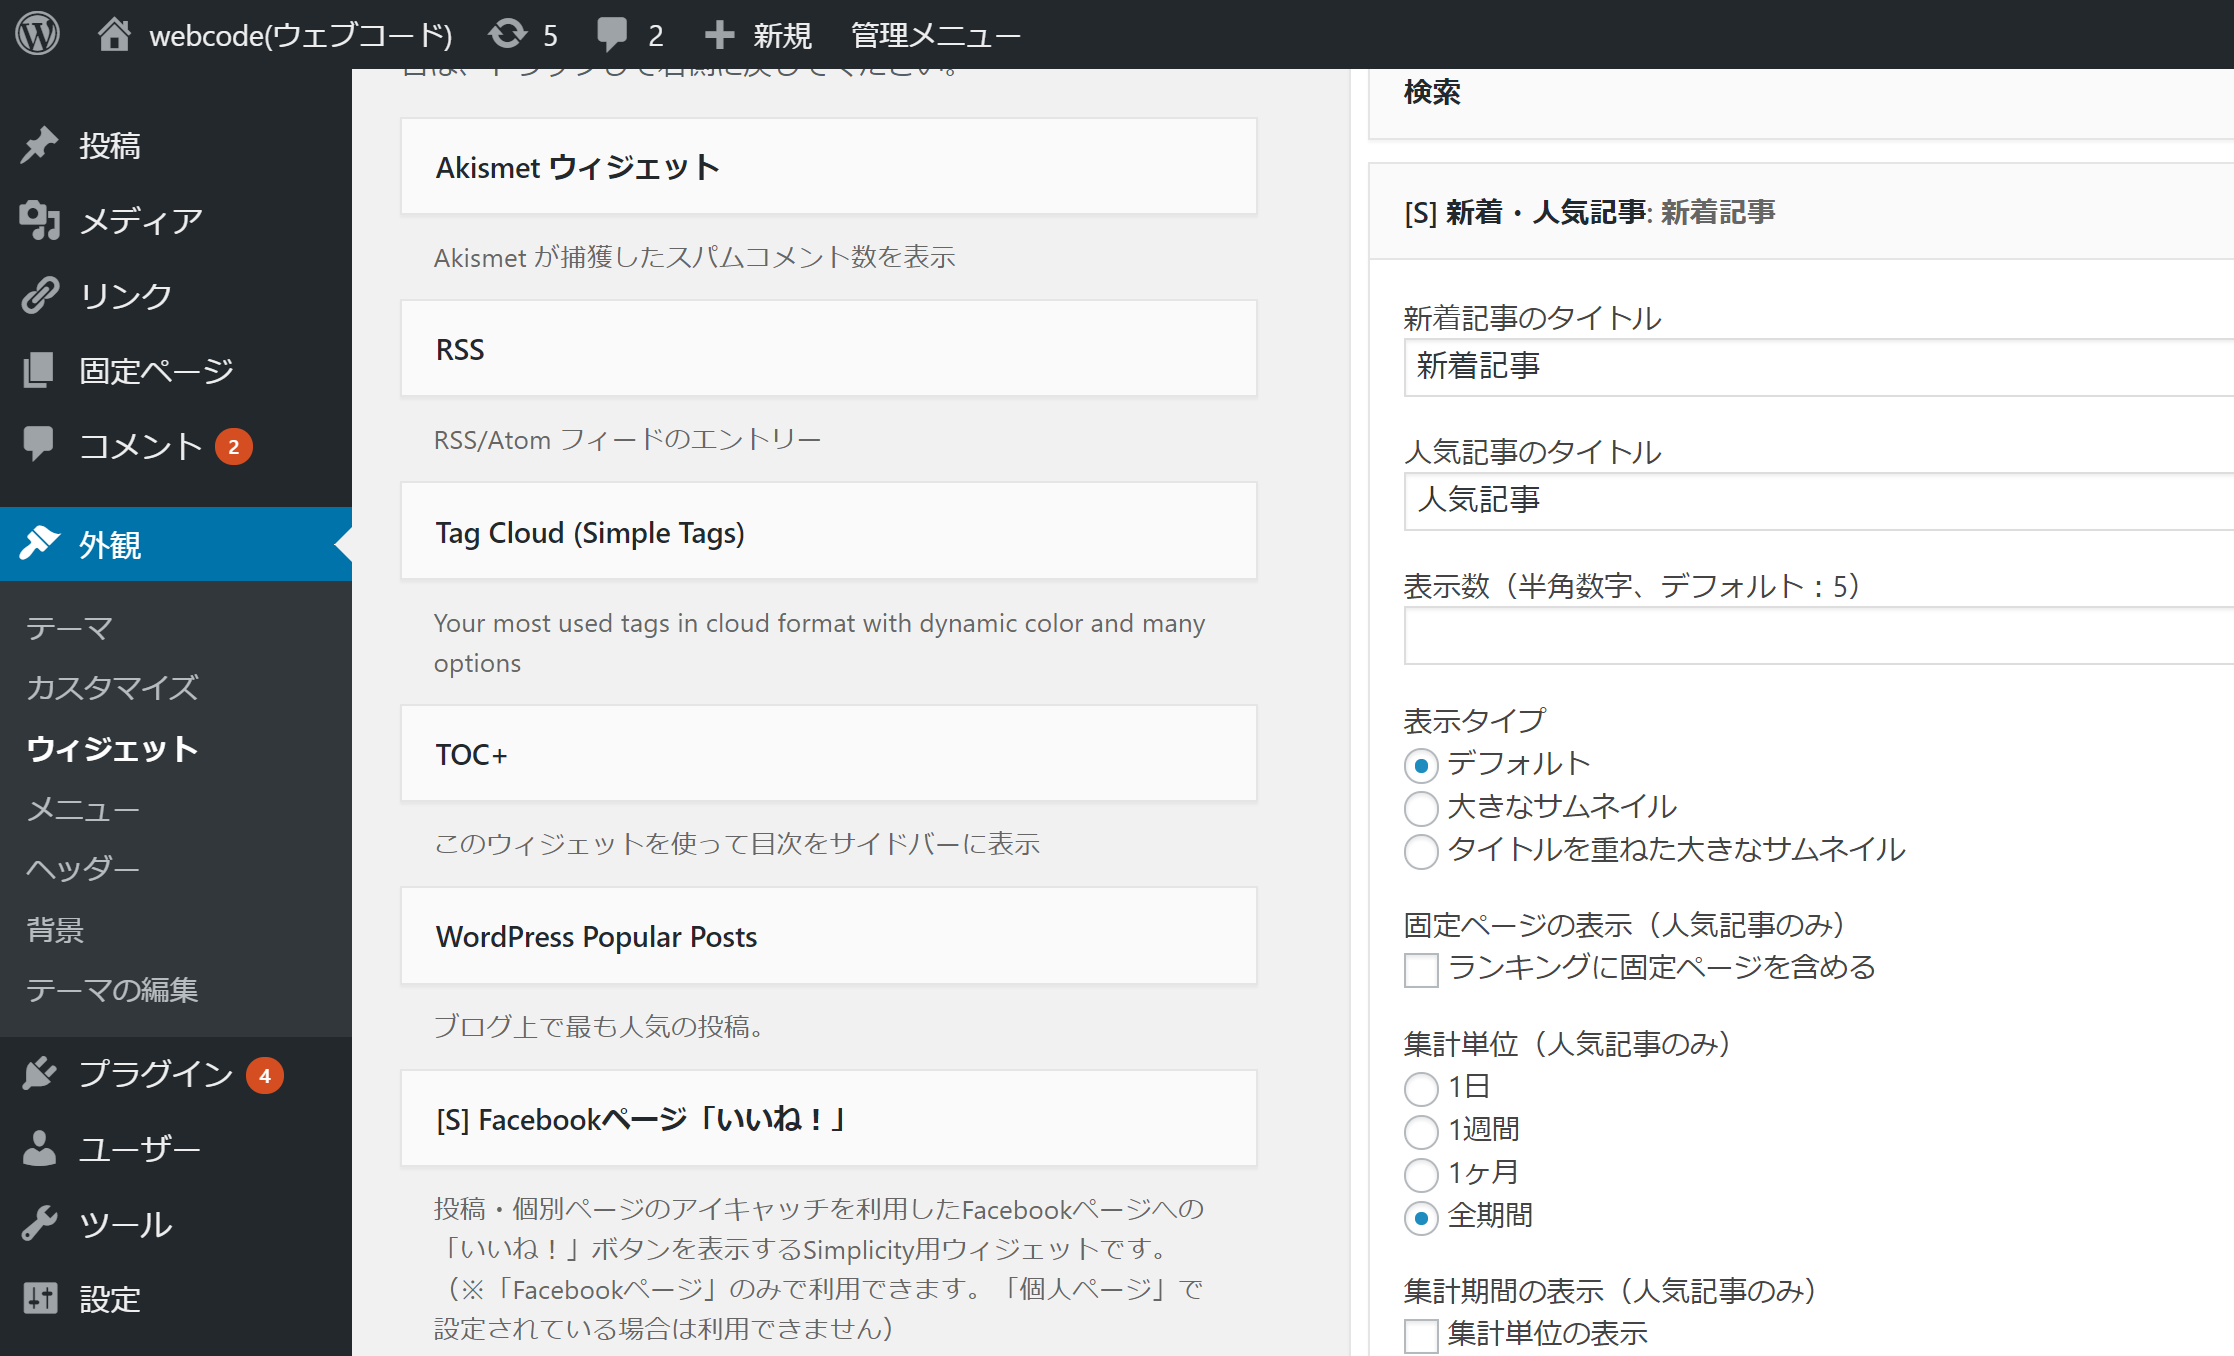 wpp sidebar - WordPress Popular Postsの設定やカスタマイズの方法まとめ!人気記事をランキング形式で表示